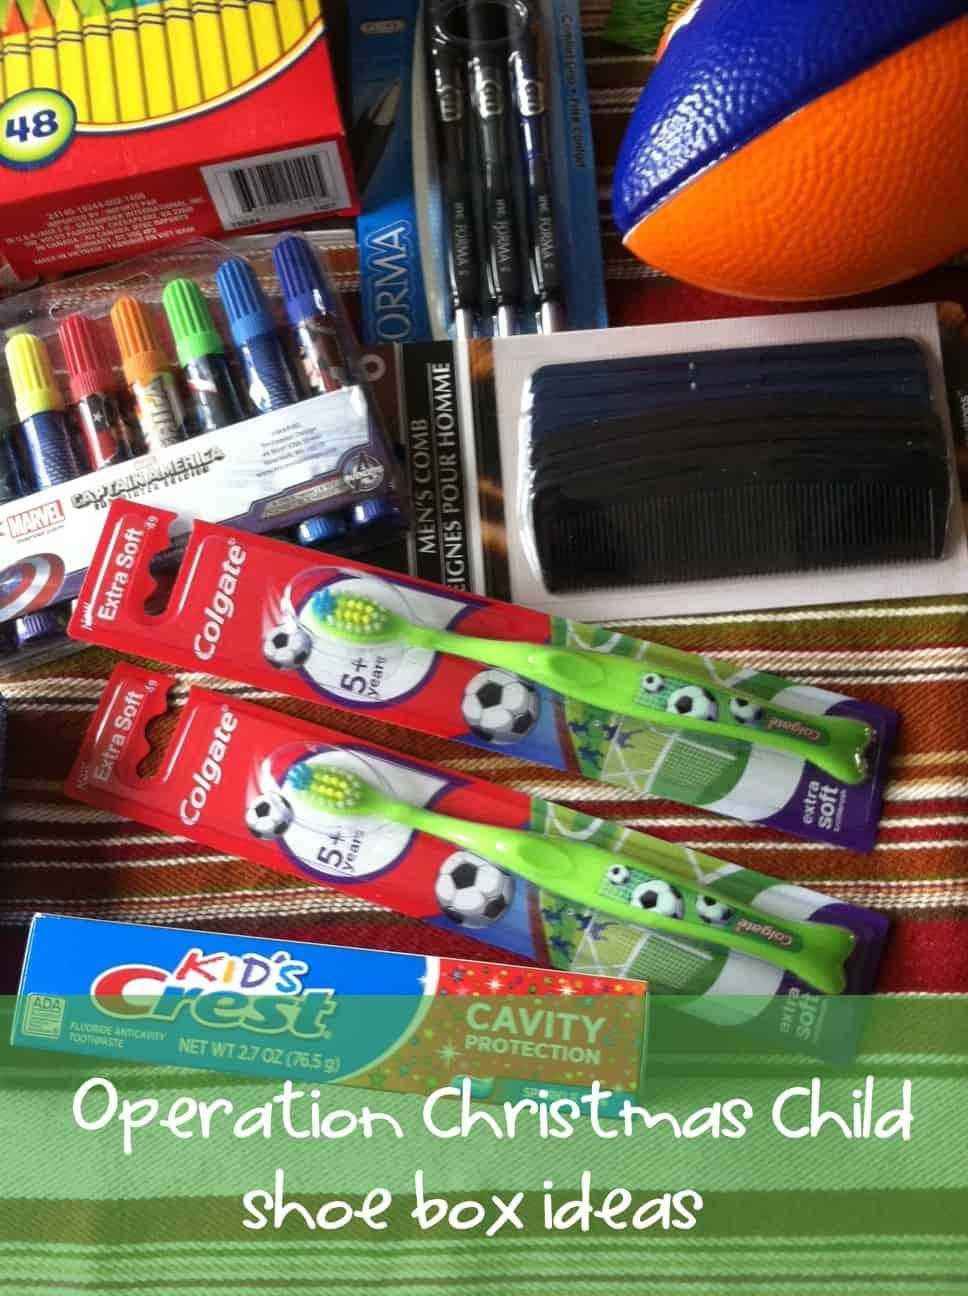 operation christmas child ideas 3 jpg - Operation Christmas Child Ideas